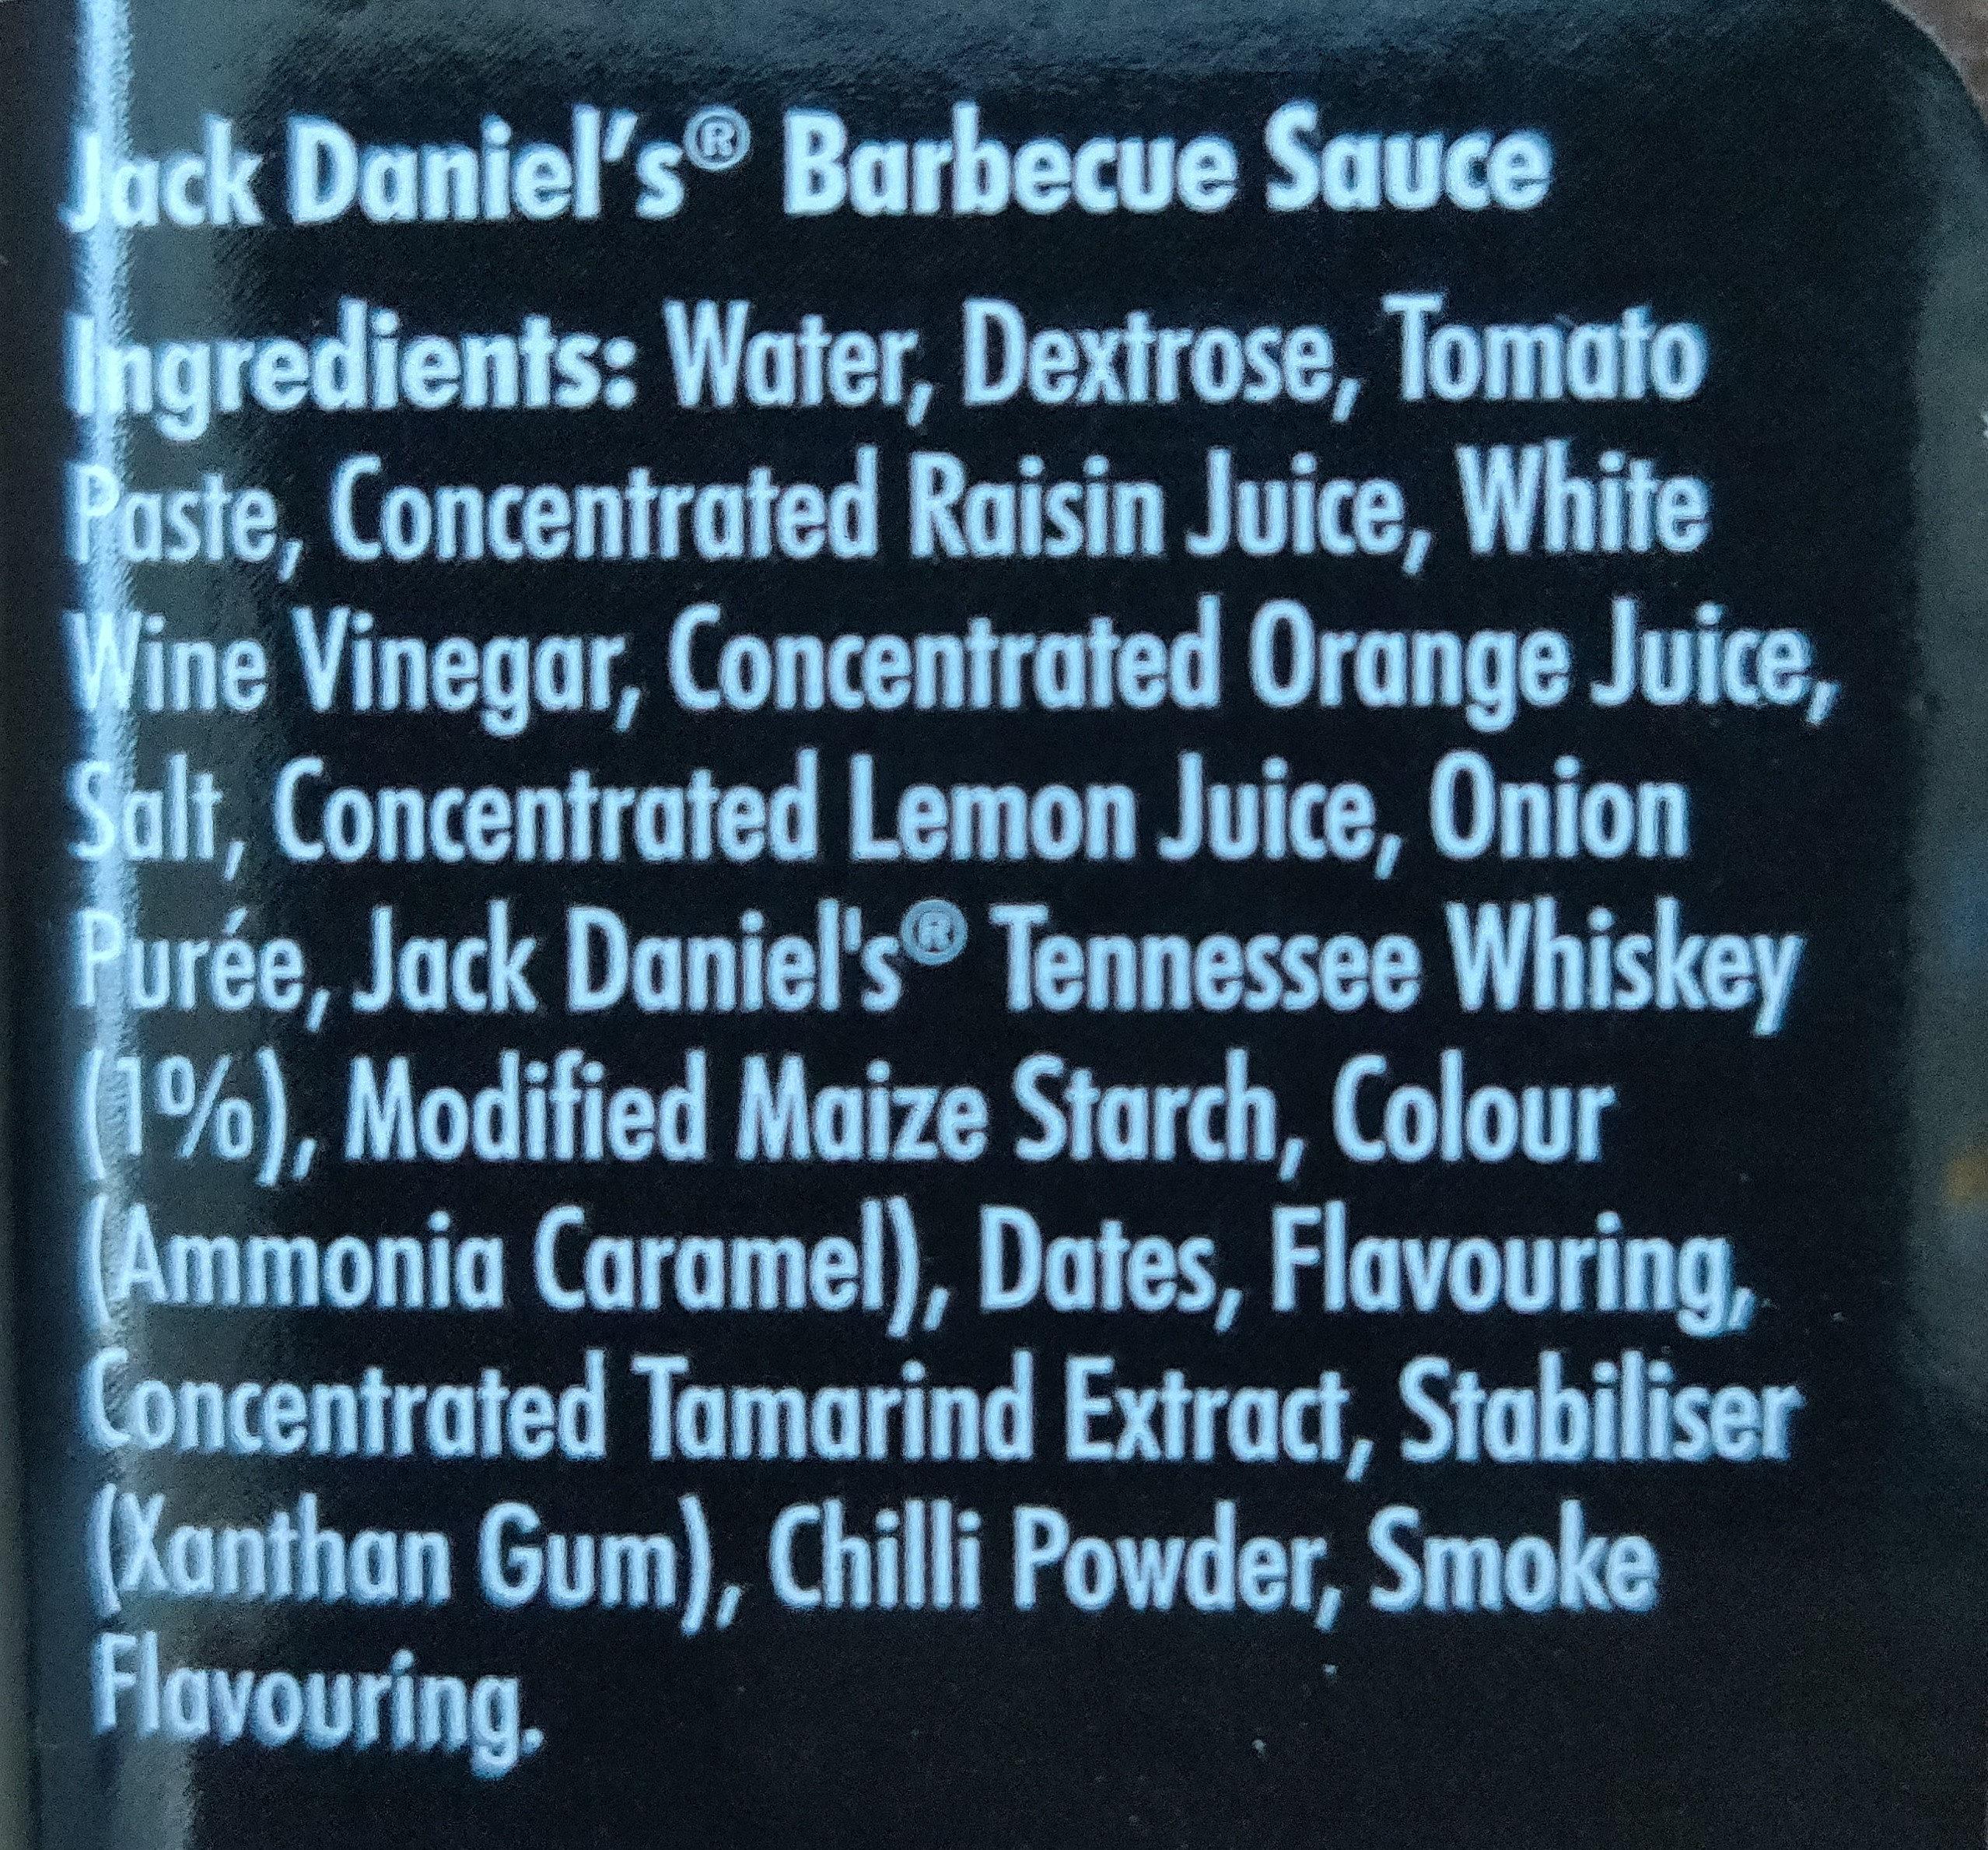 Jack Daniels BBQ Sauce - Ingredients